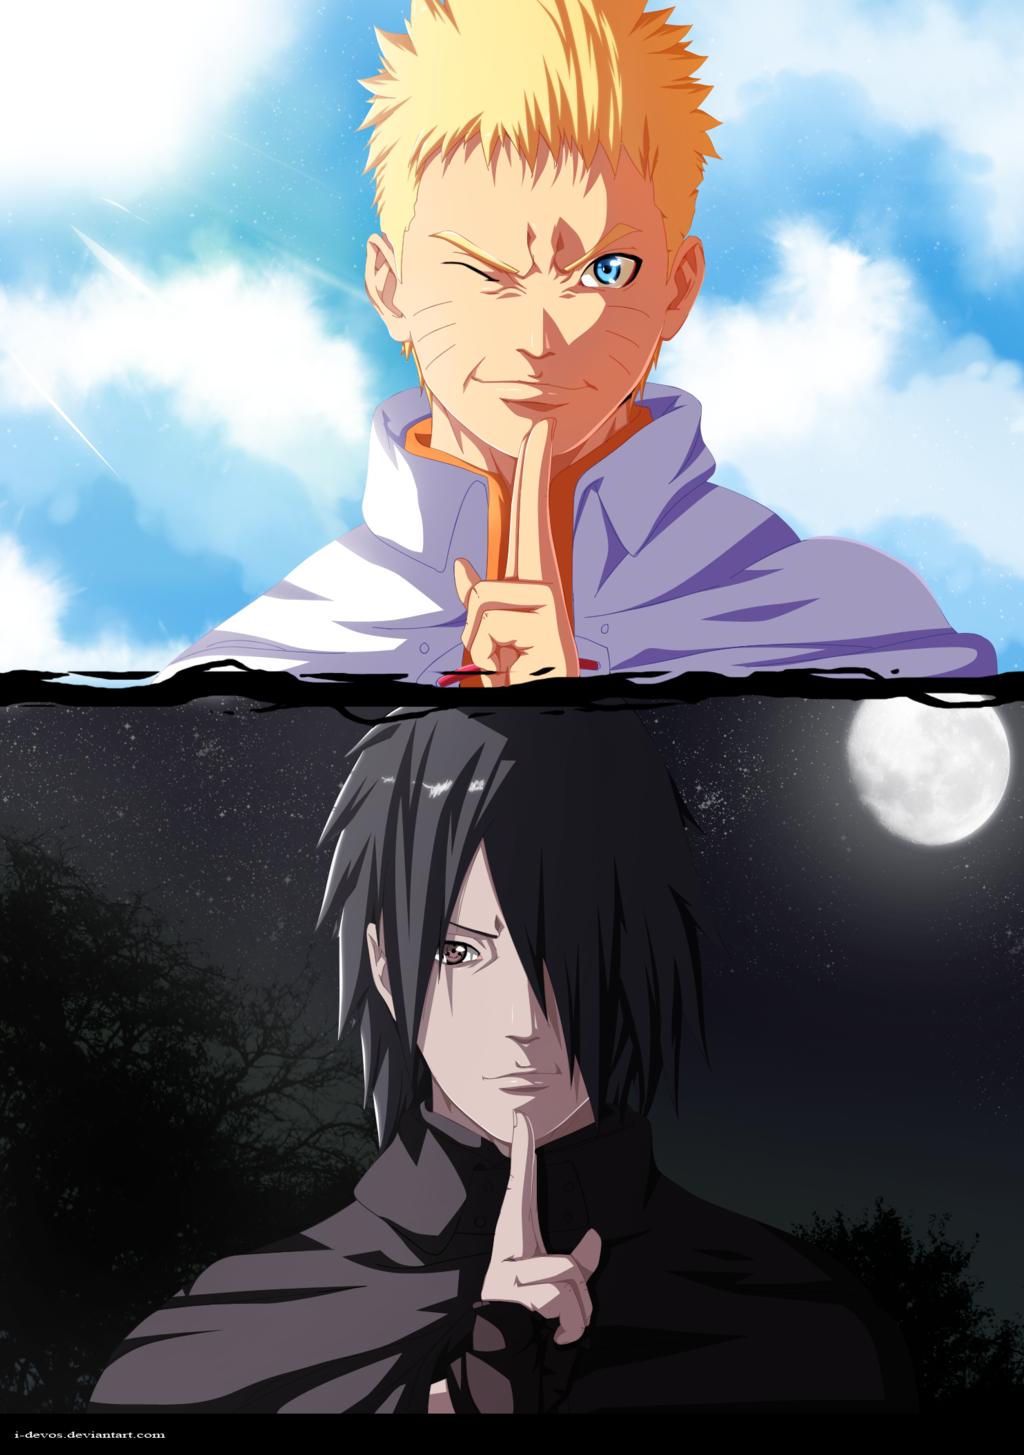 Naruto and sasuke coloring by i devosiantart on naruto and sasuke coloring by i devosiantart on deviantart voltagebd Images